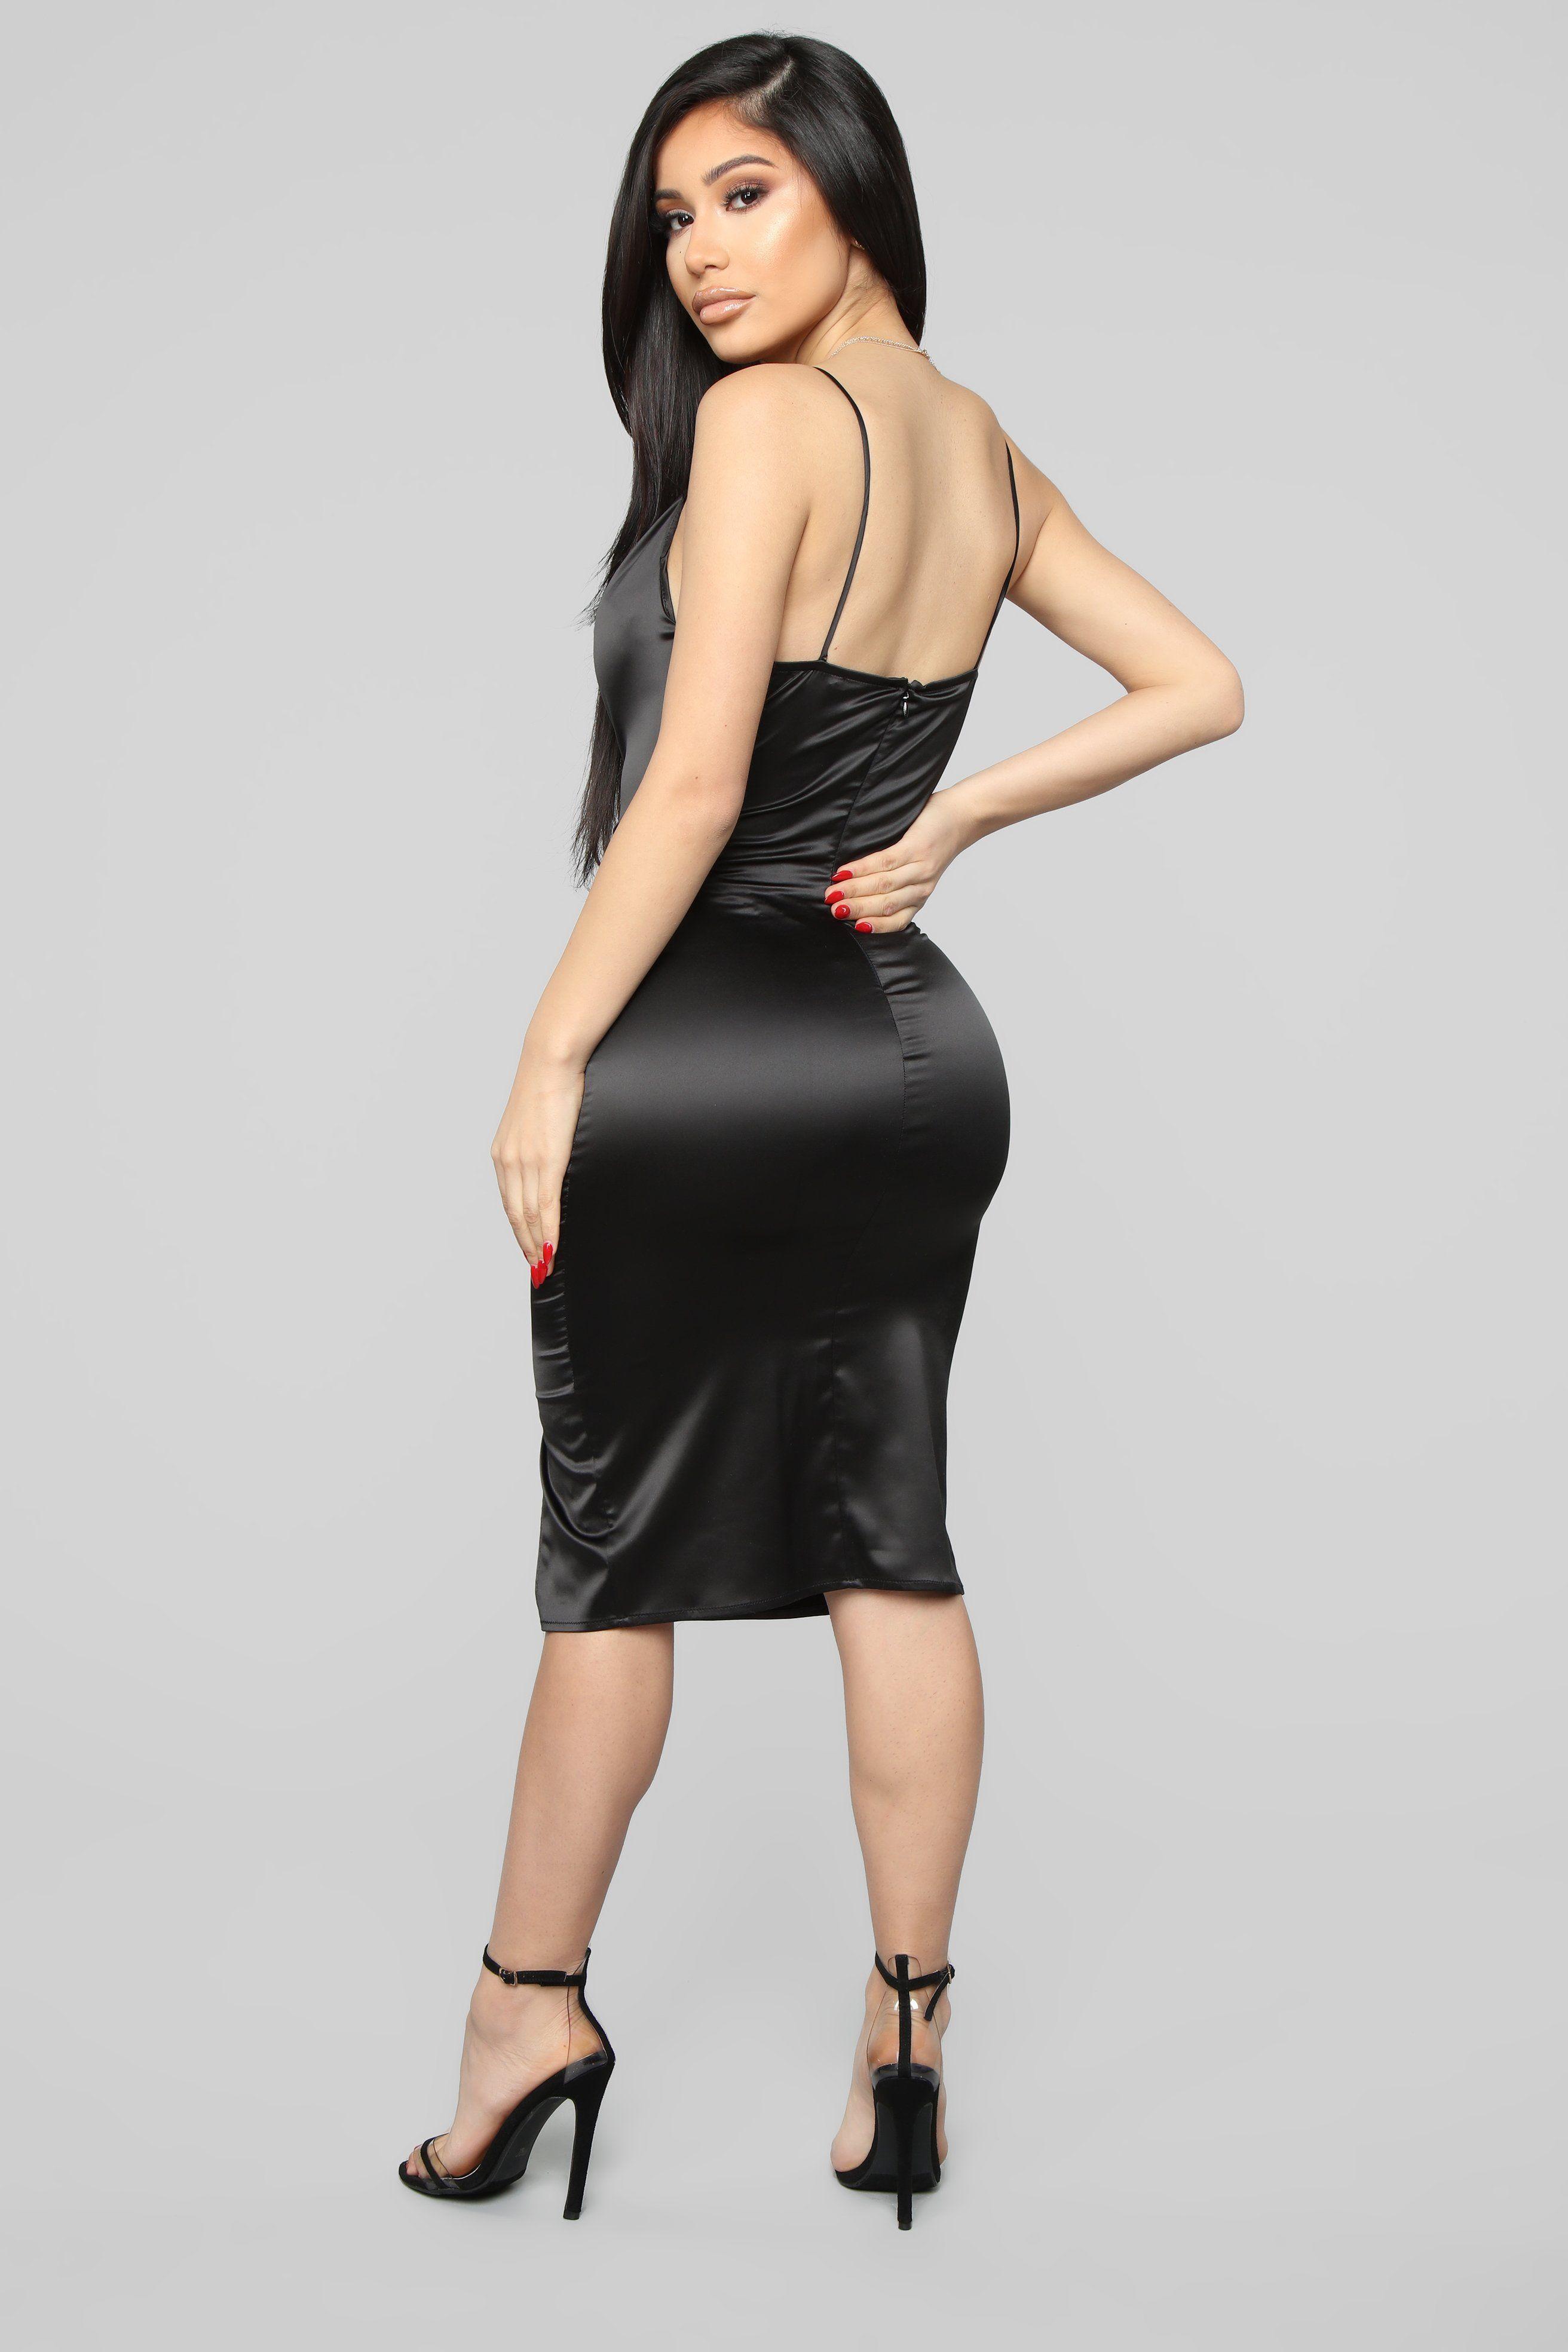 5d932c5e4b4 I Know You See Me Midi Dress - Black in 2019